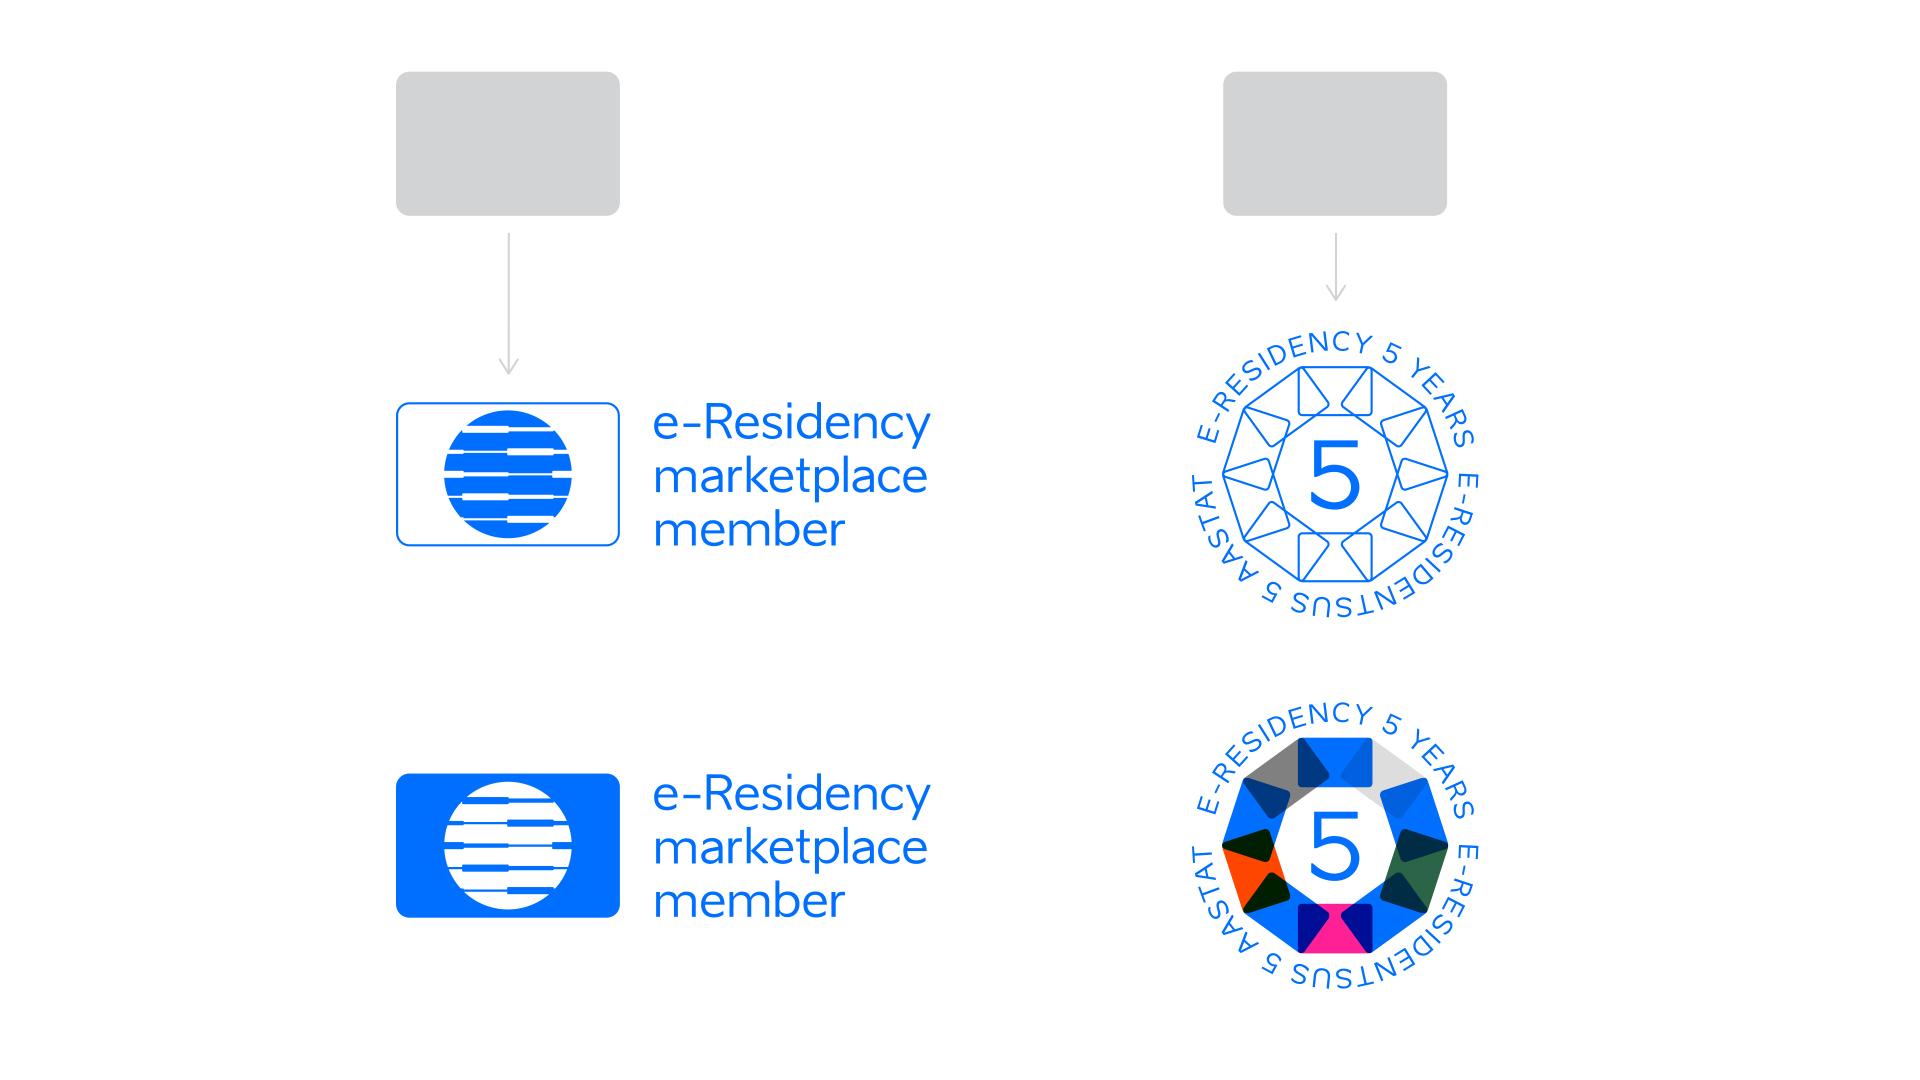 e-residency identity symbols and logo